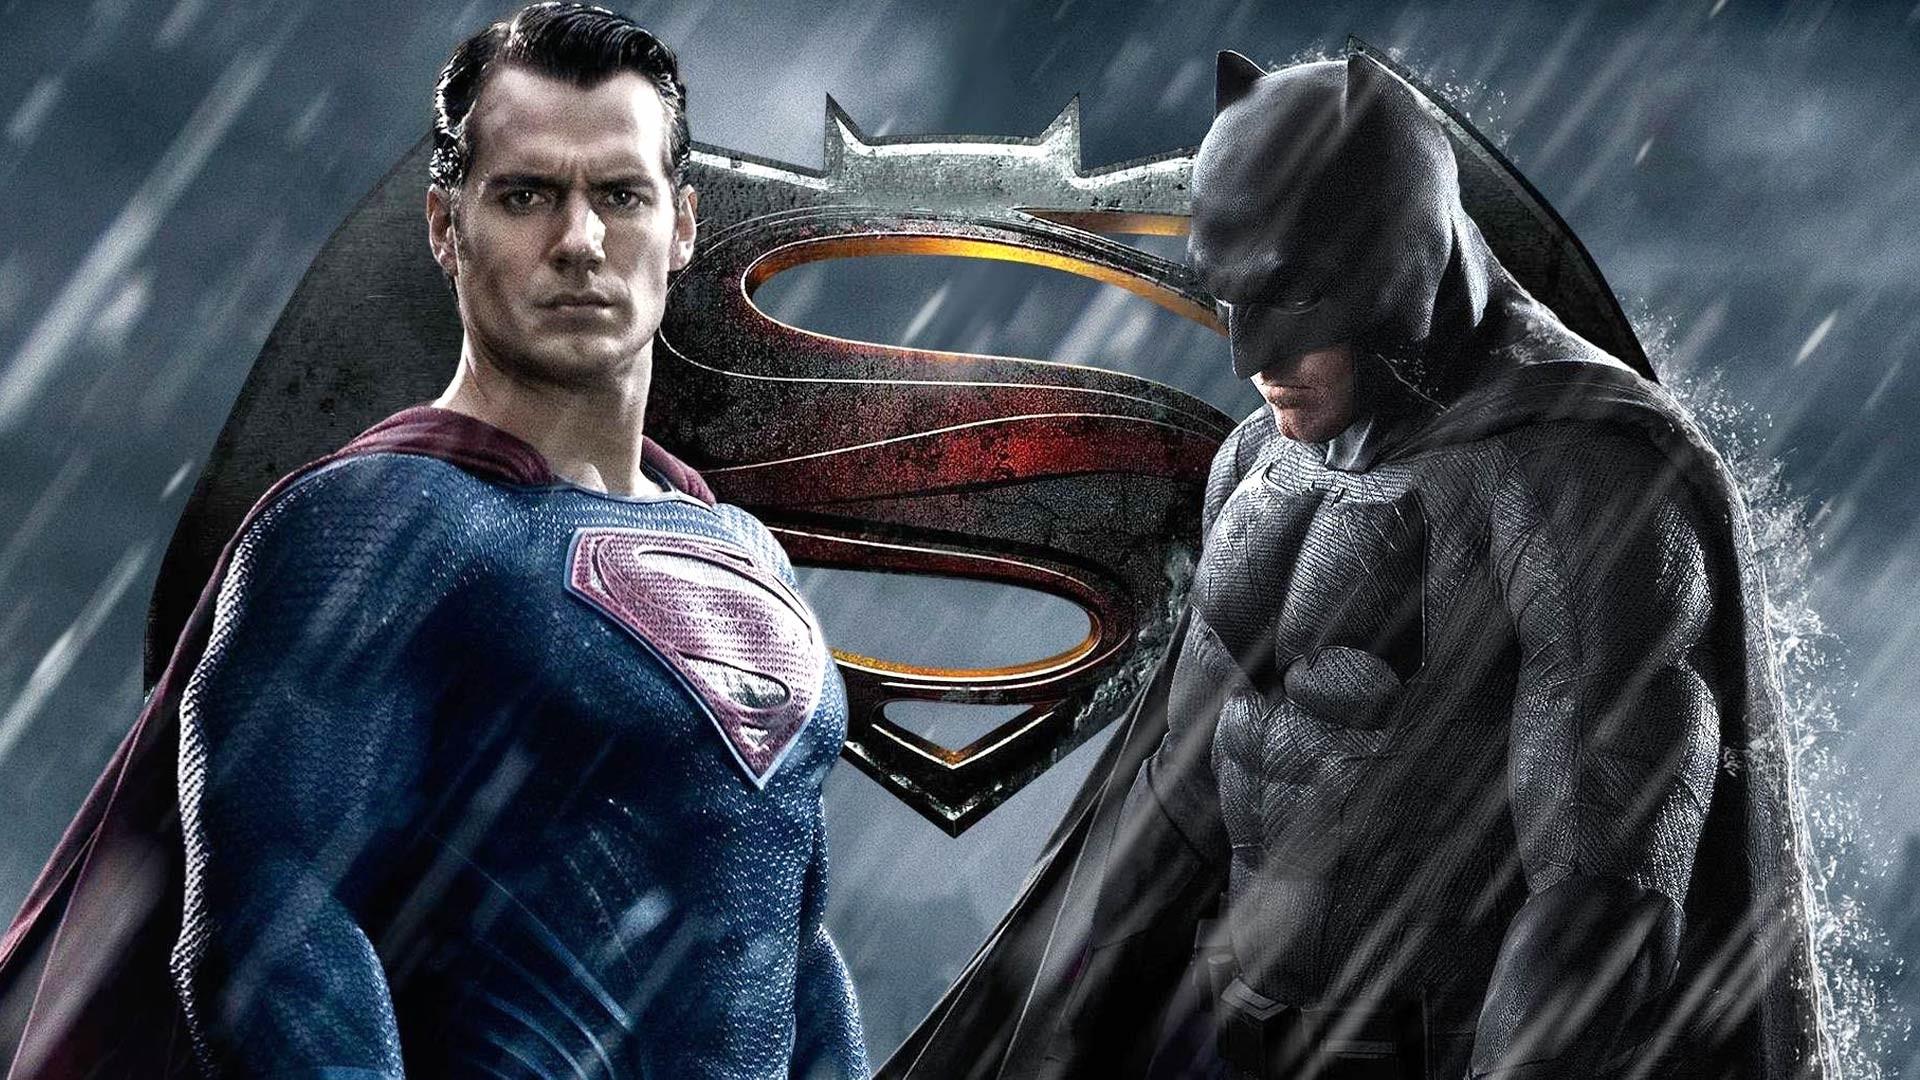 … batman-vs-superman-wallpaper-hd-1080p-1920×1080-desktop.jpg …